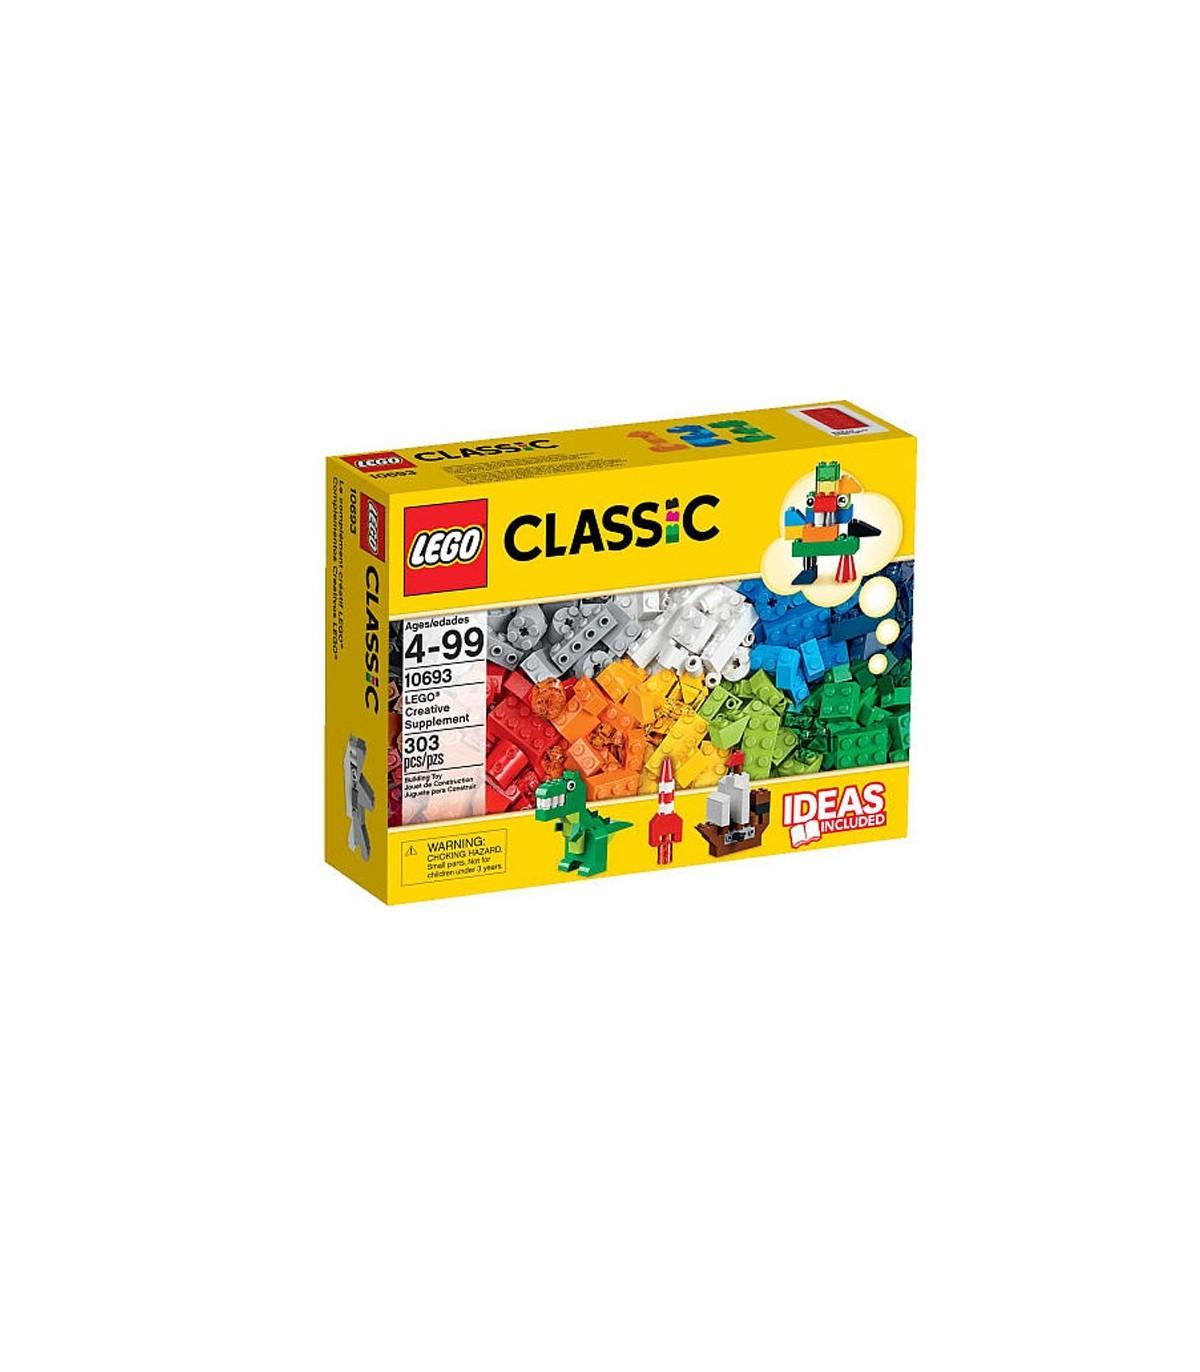 لگو Classic 10693